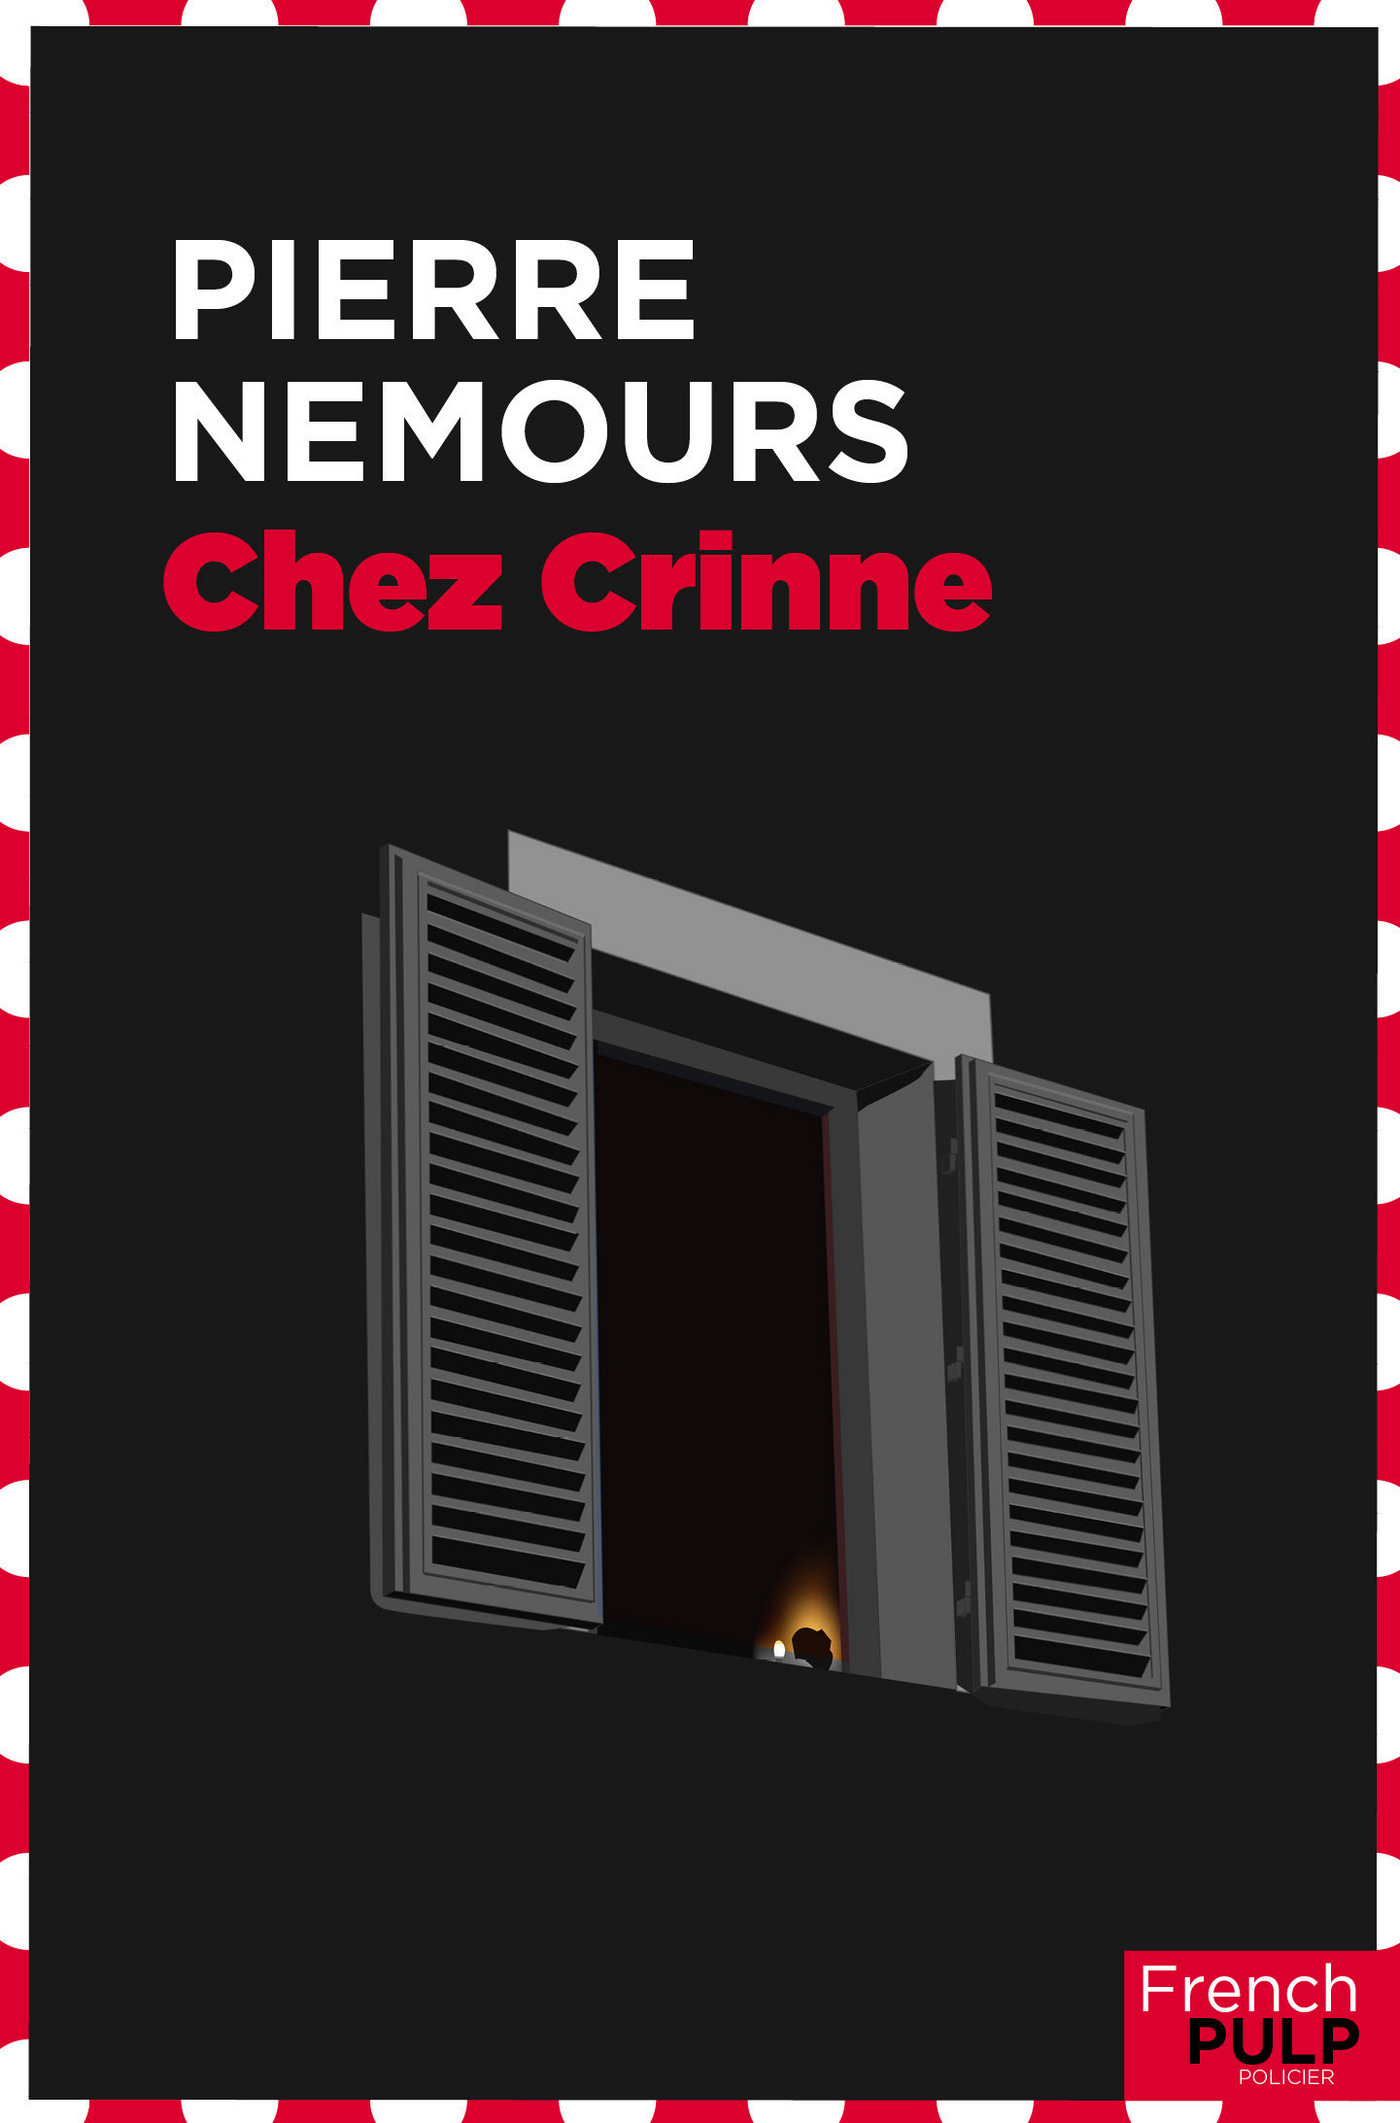 Chez Crinne